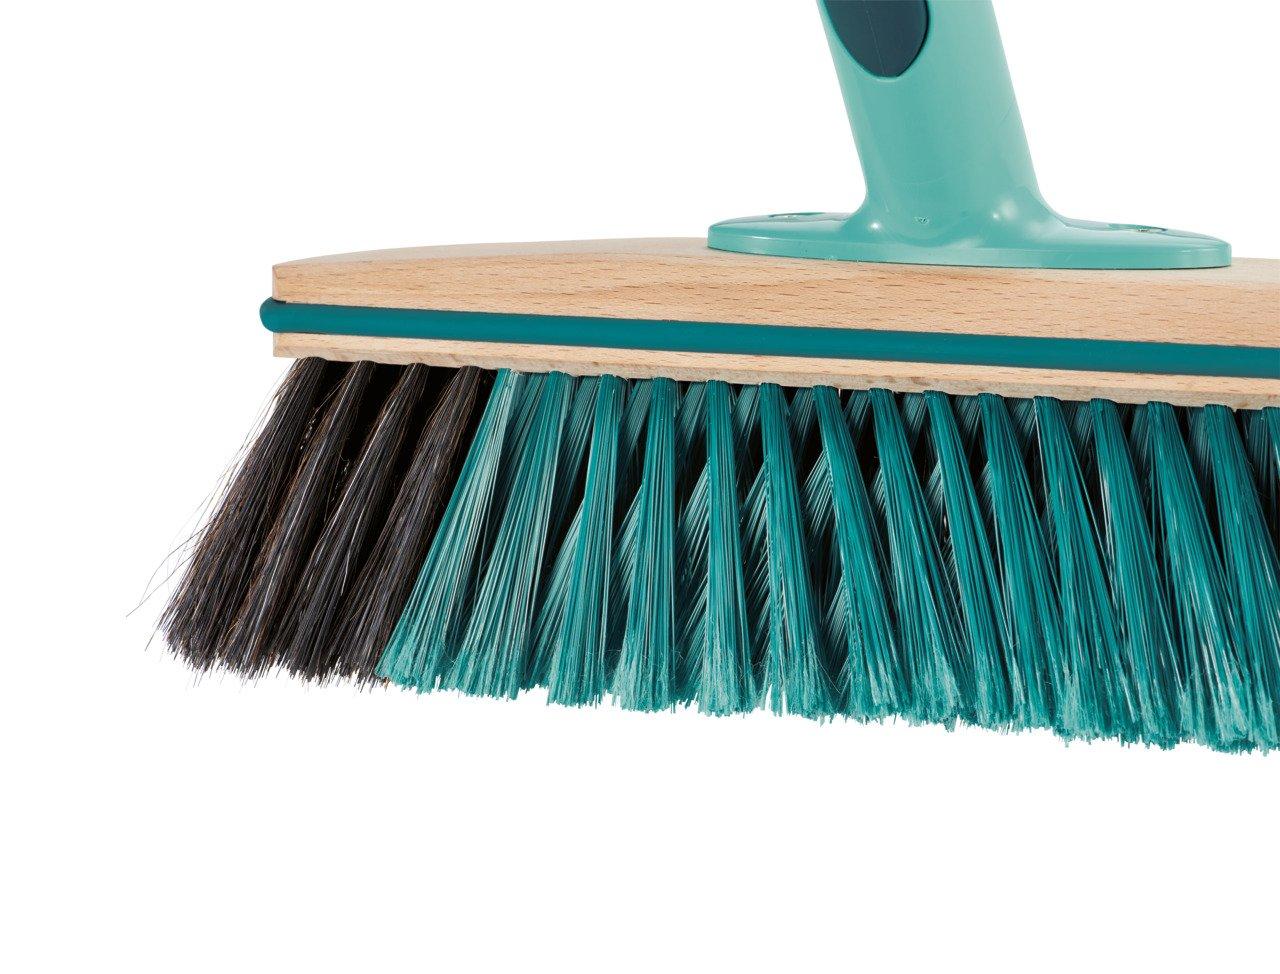 Leifheit Hard Floor Broom Xtra Clean Eco Plus 30 cm, Floor Broom, House Broom, Dustpan Brush, Wood / Mint Green, 45002 by Leifheit (Image #5)